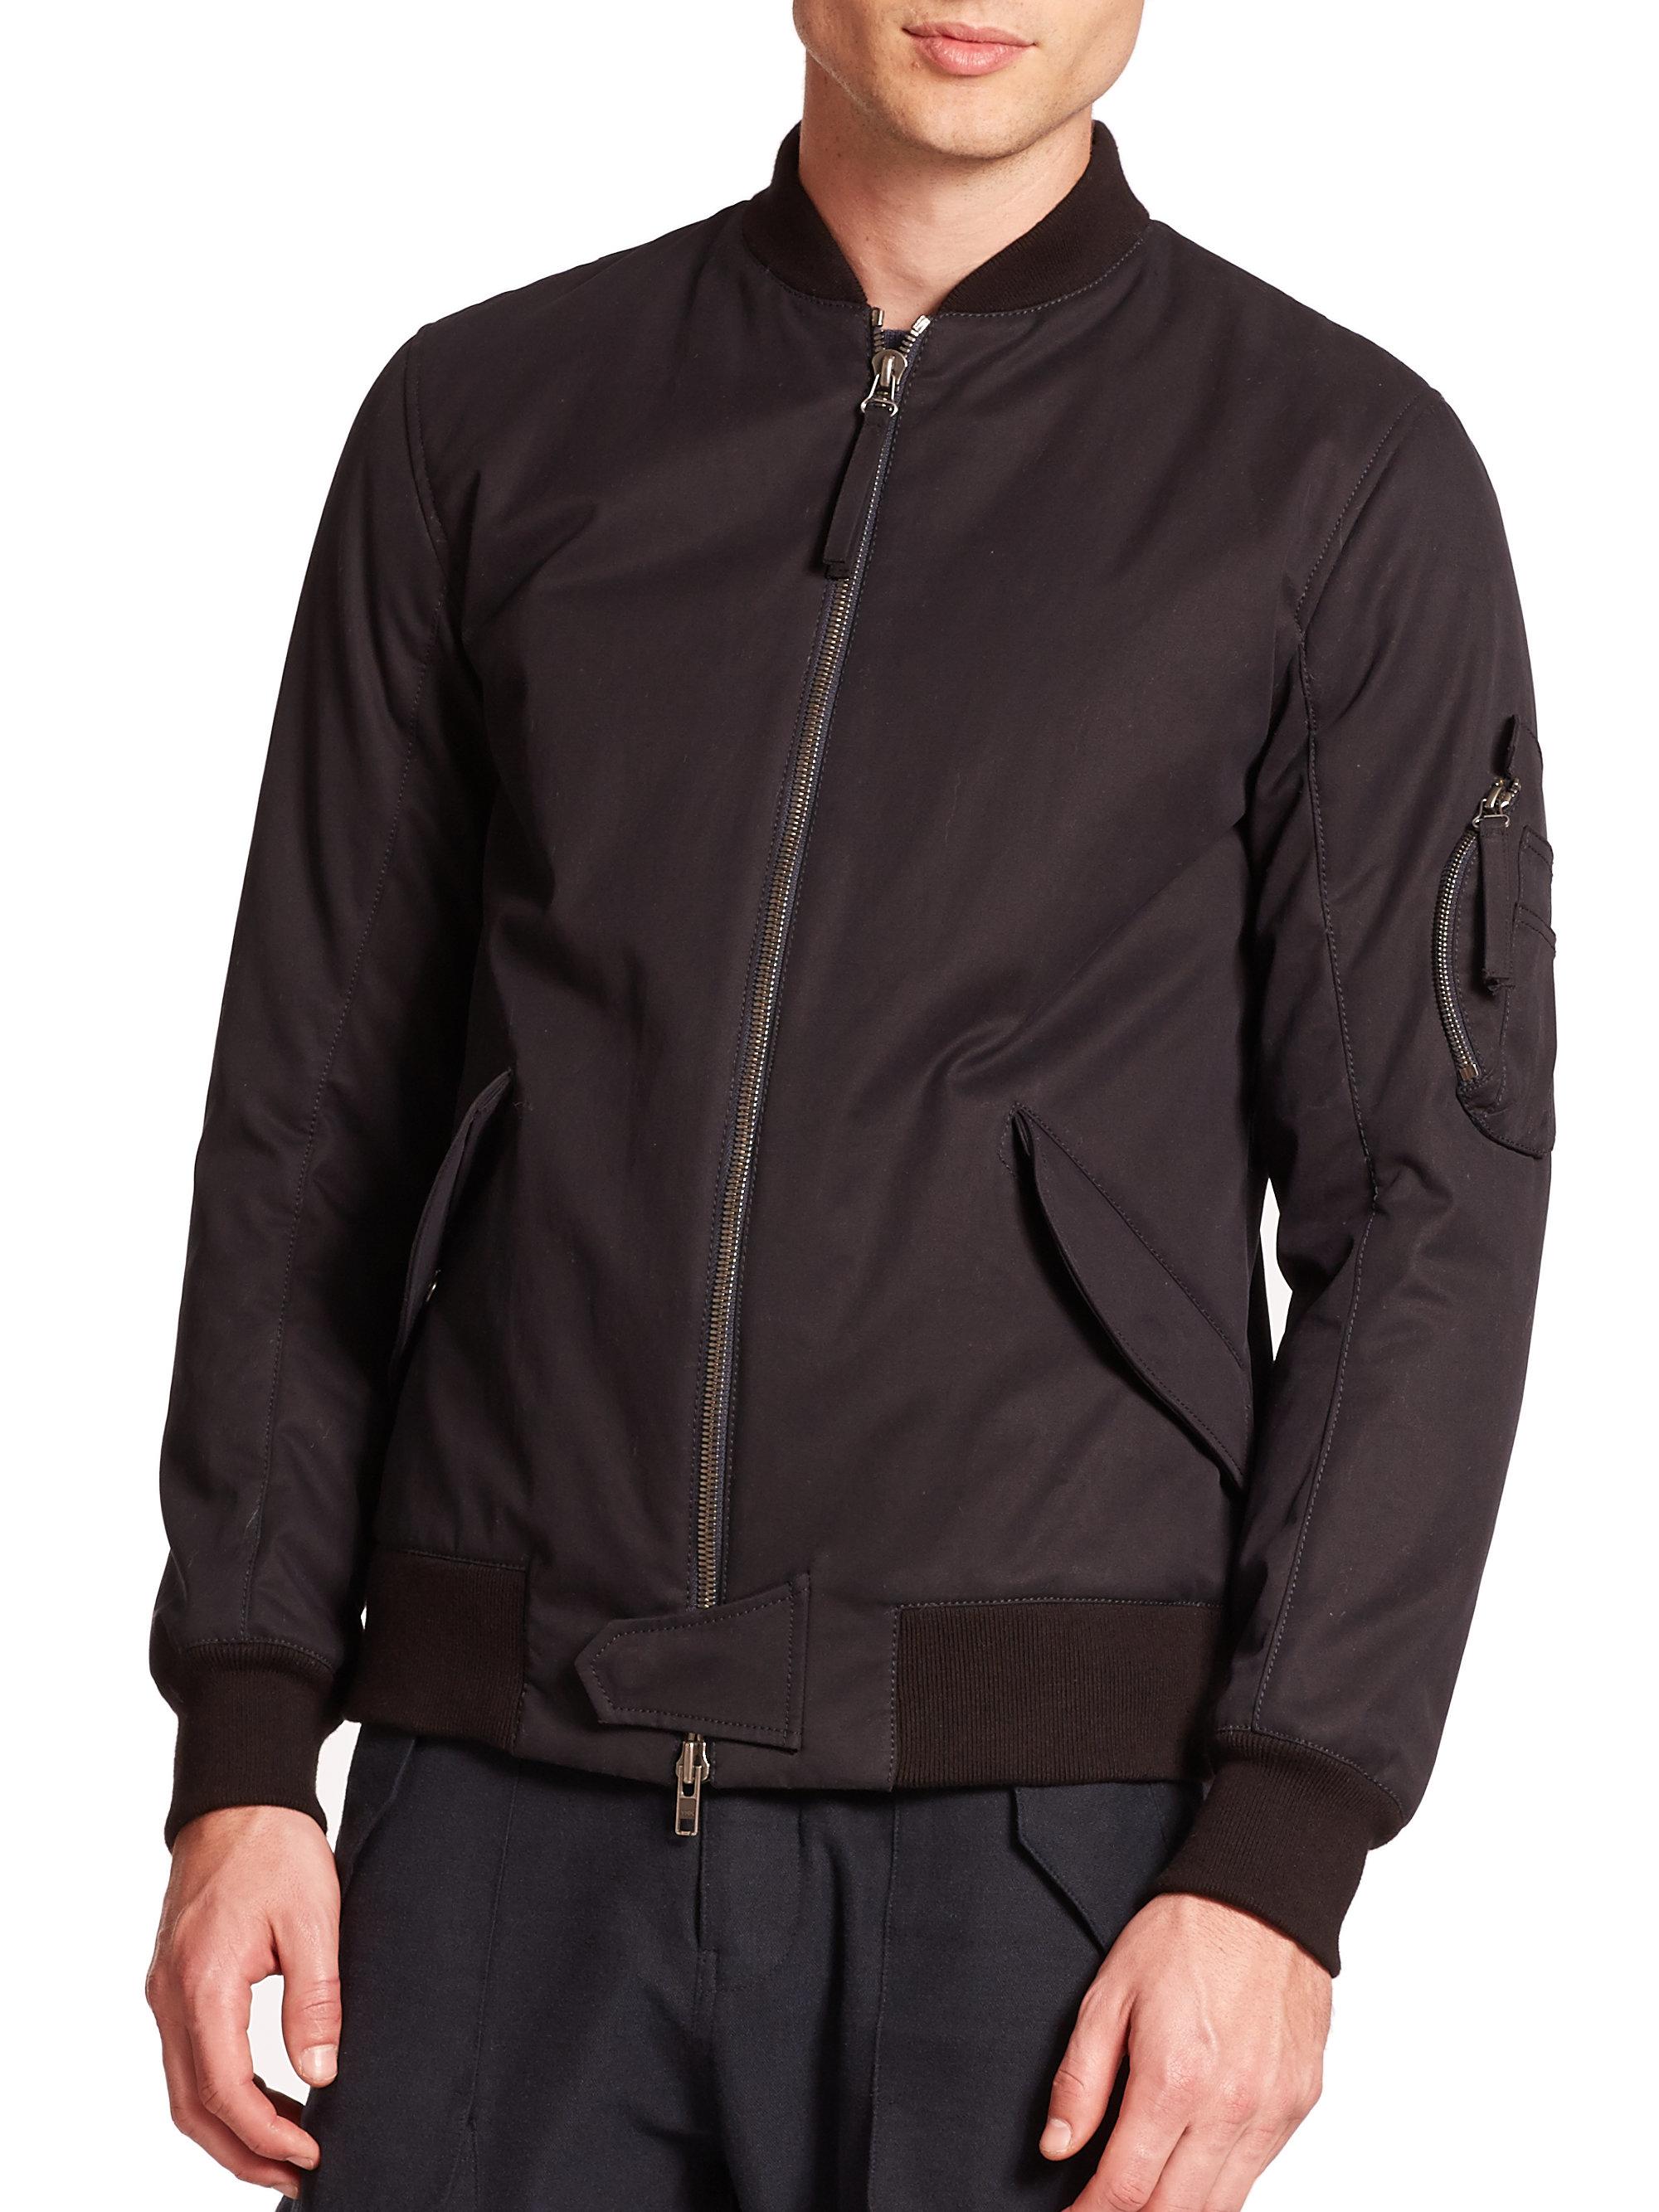 Helmut lang Cotton Twill Bomber Jacket in Black for Men | Lyst